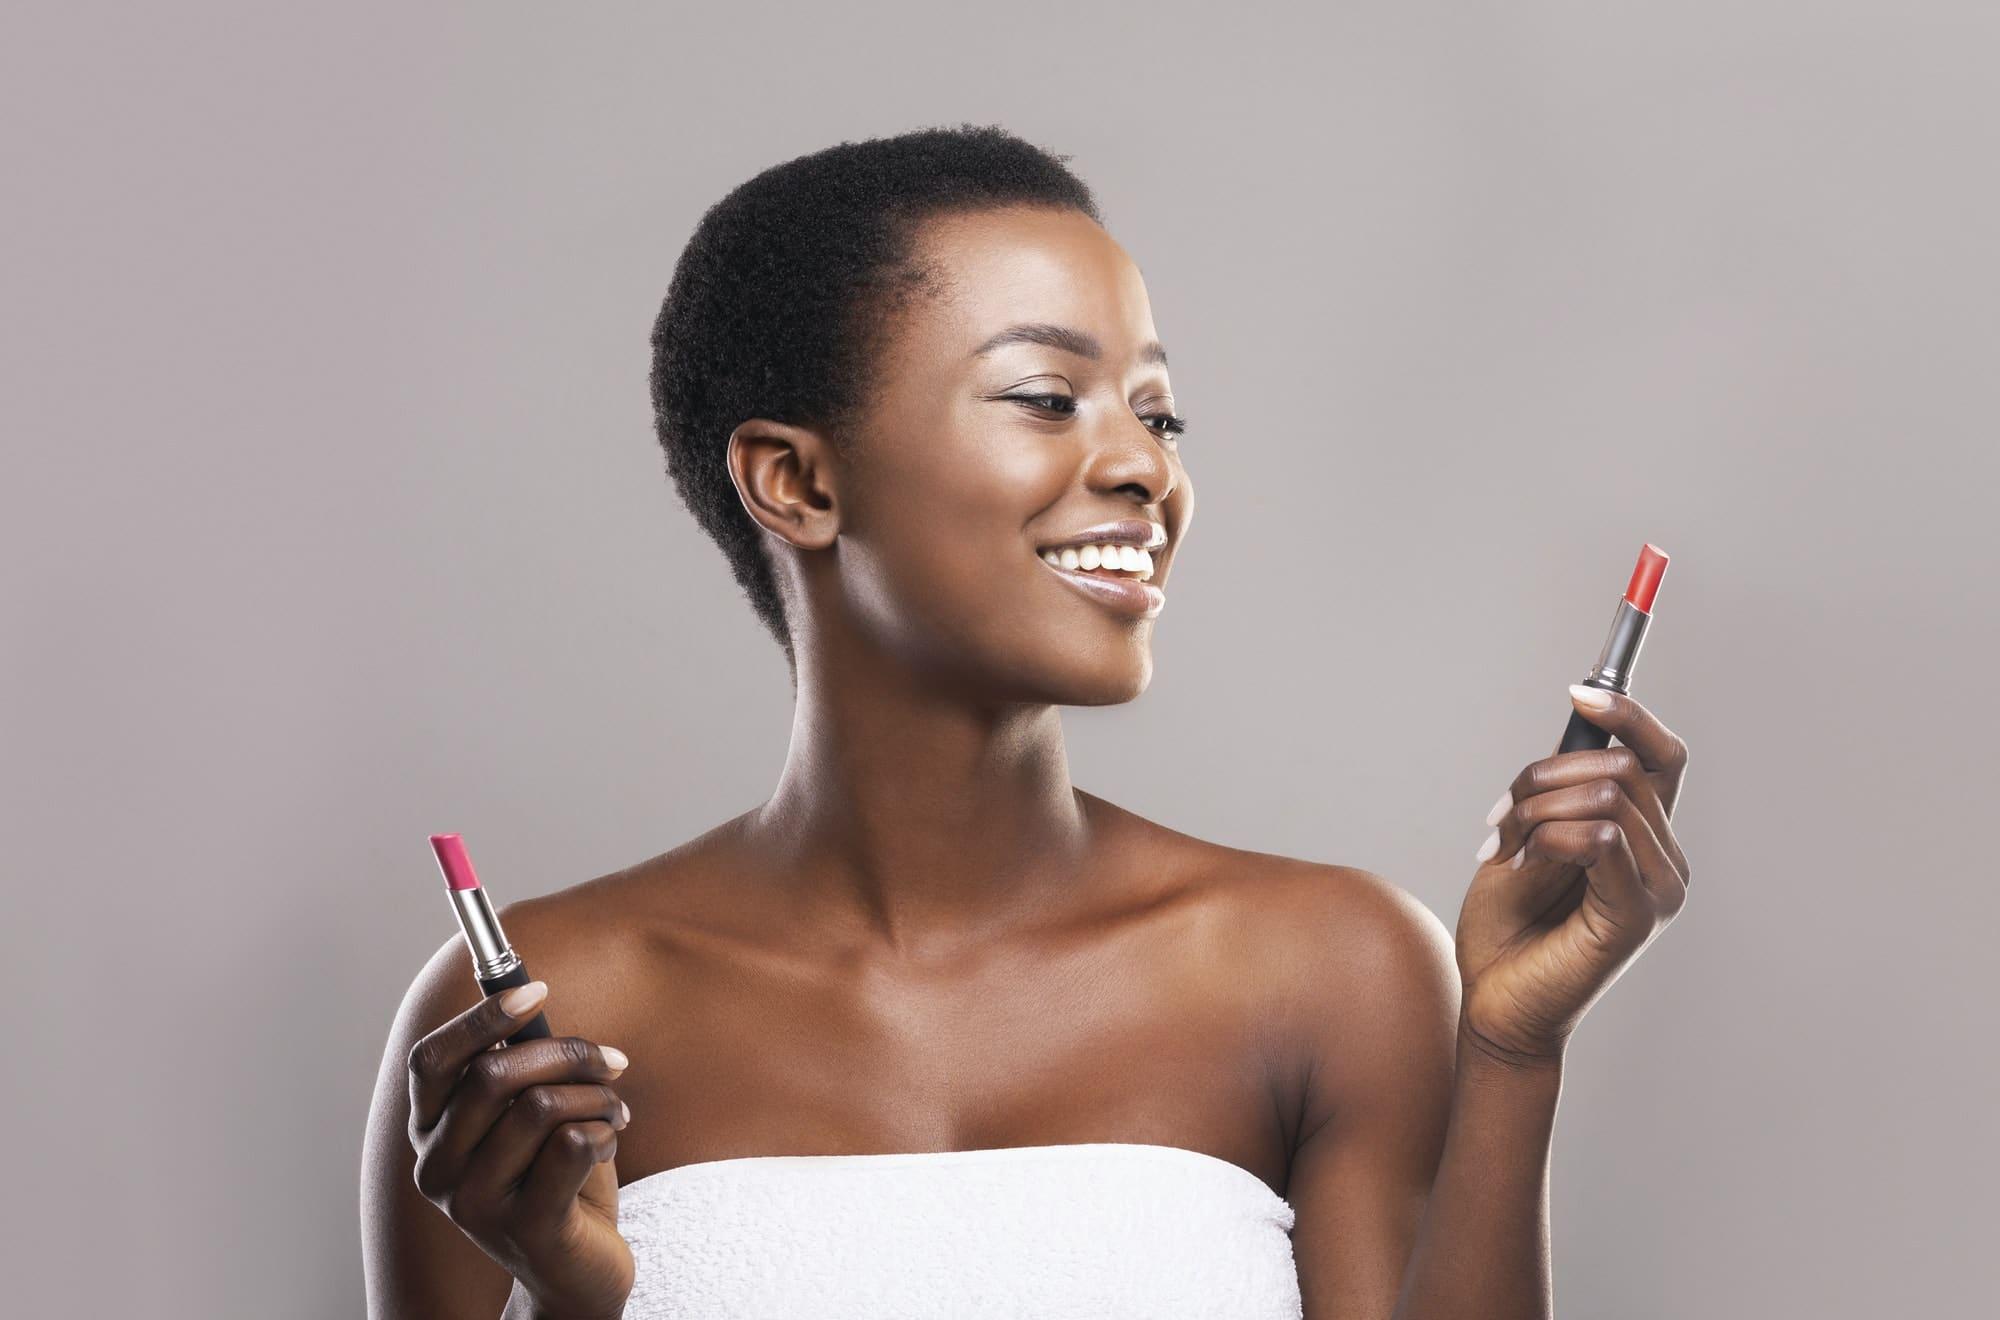 African american woman choosing between two lipstick colors